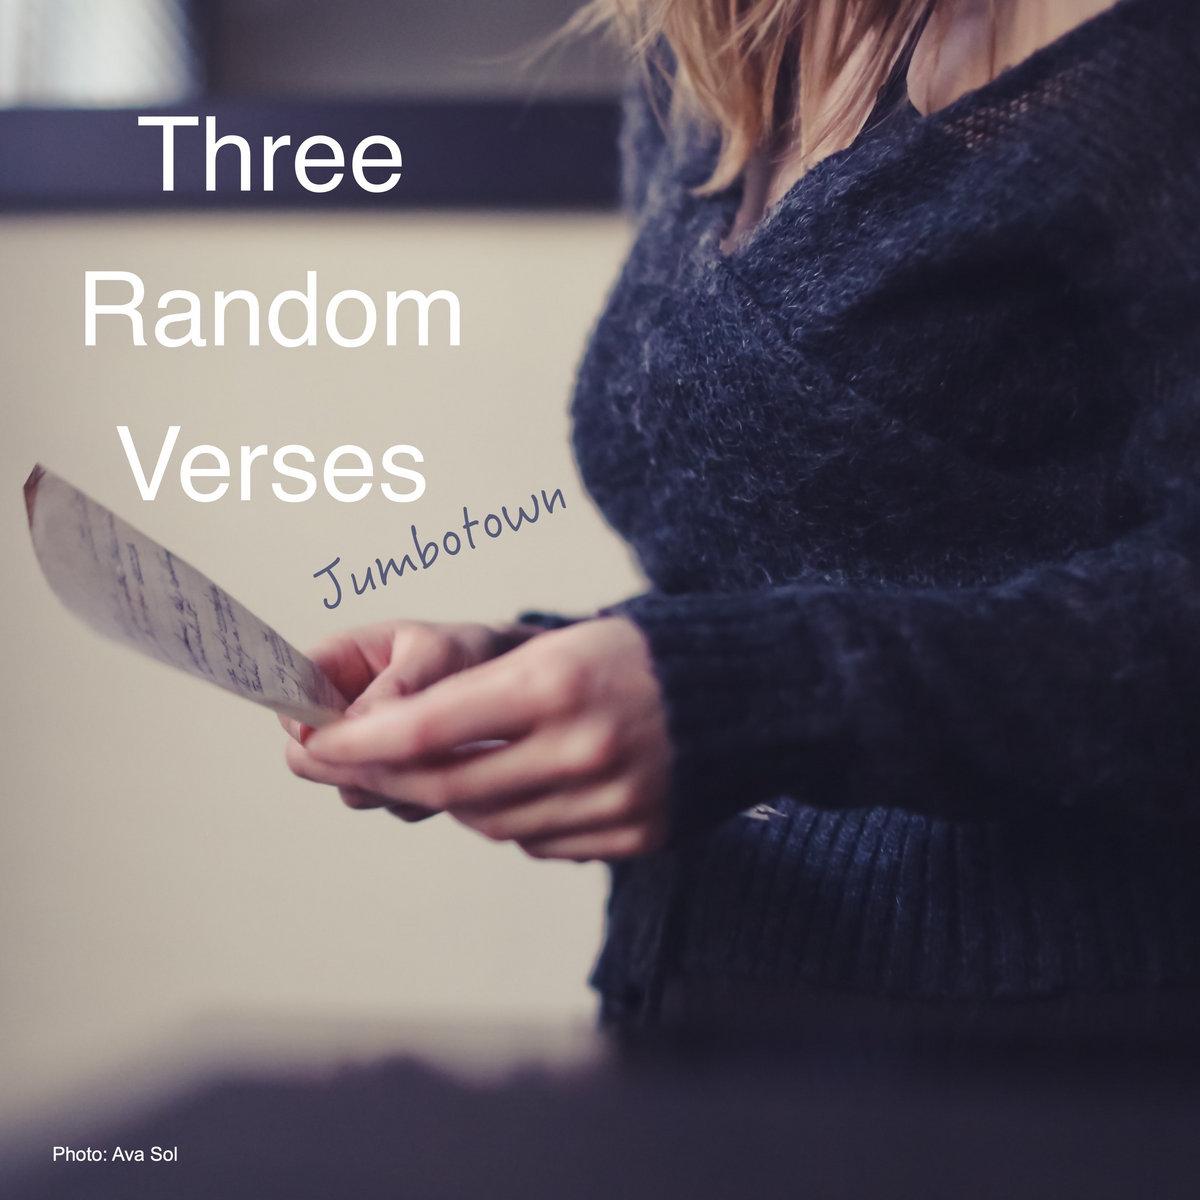 Three Random Verses by Jumbotown